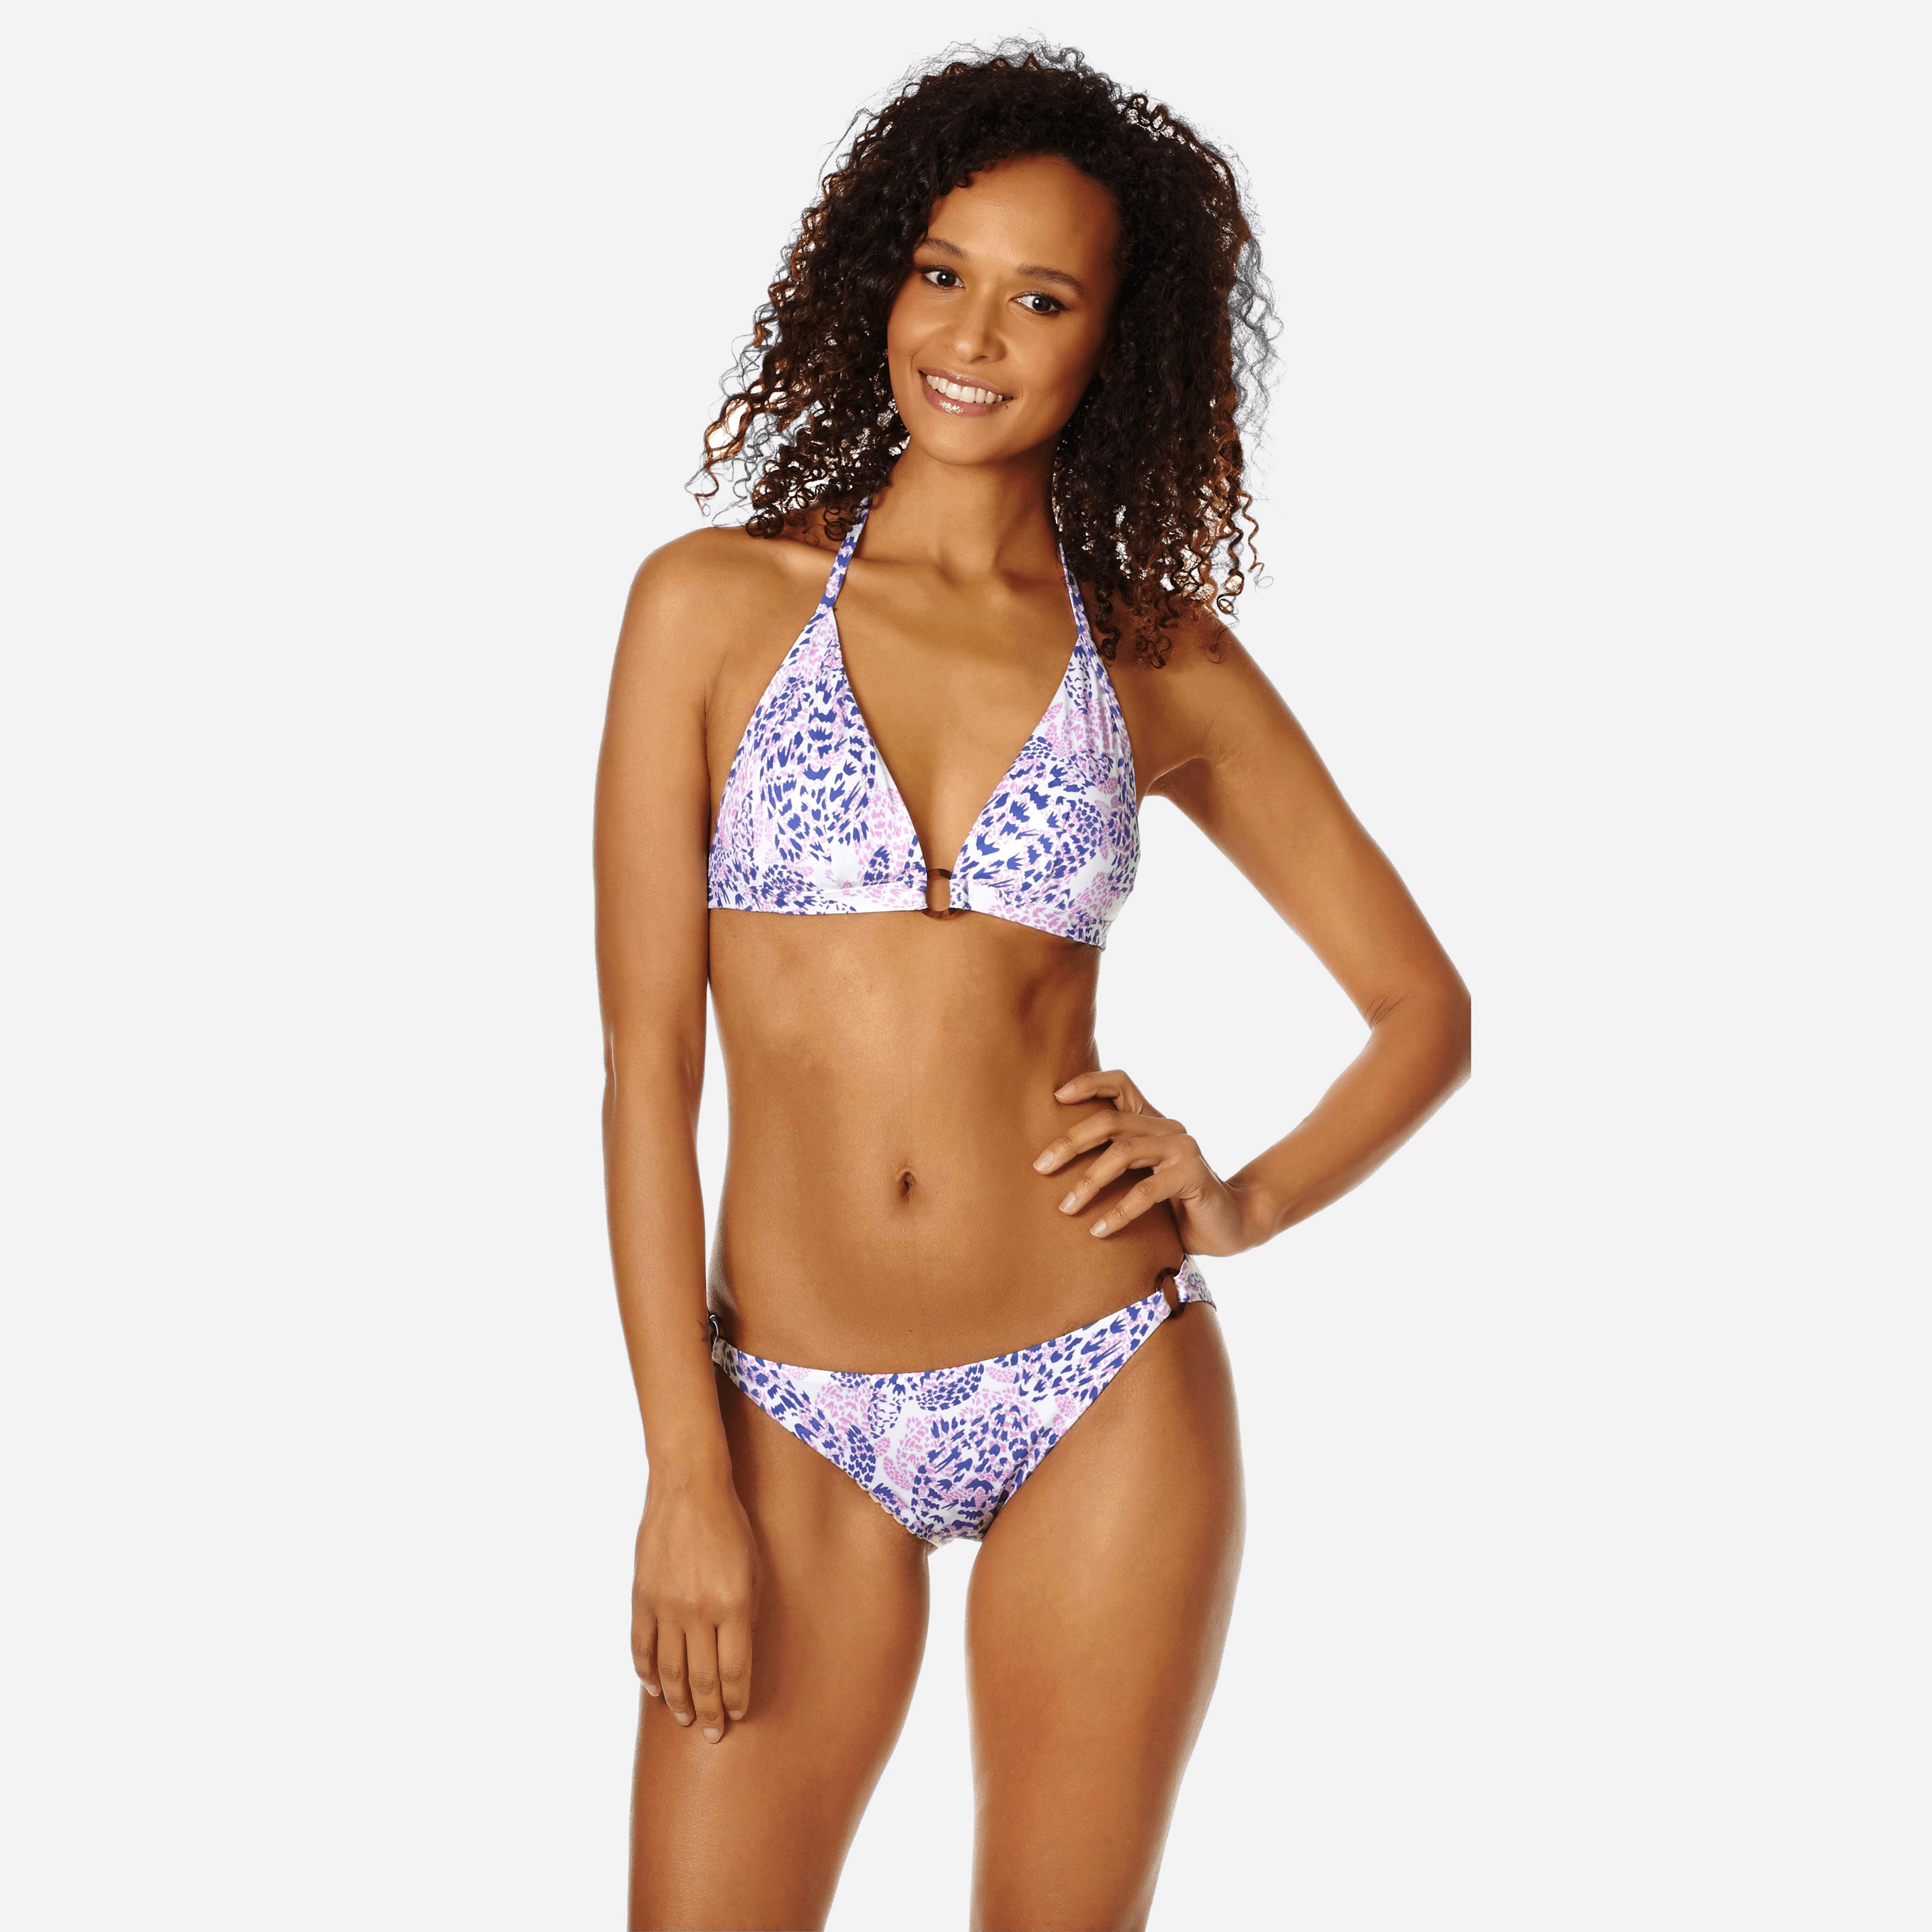 VILEBREQUIN | Women Swimwear - Women Bikini Halter Top Jungle Turtles - SWIMMING TRUNK - FLECHETT - White - XXS - Vilebrequin | Goxip